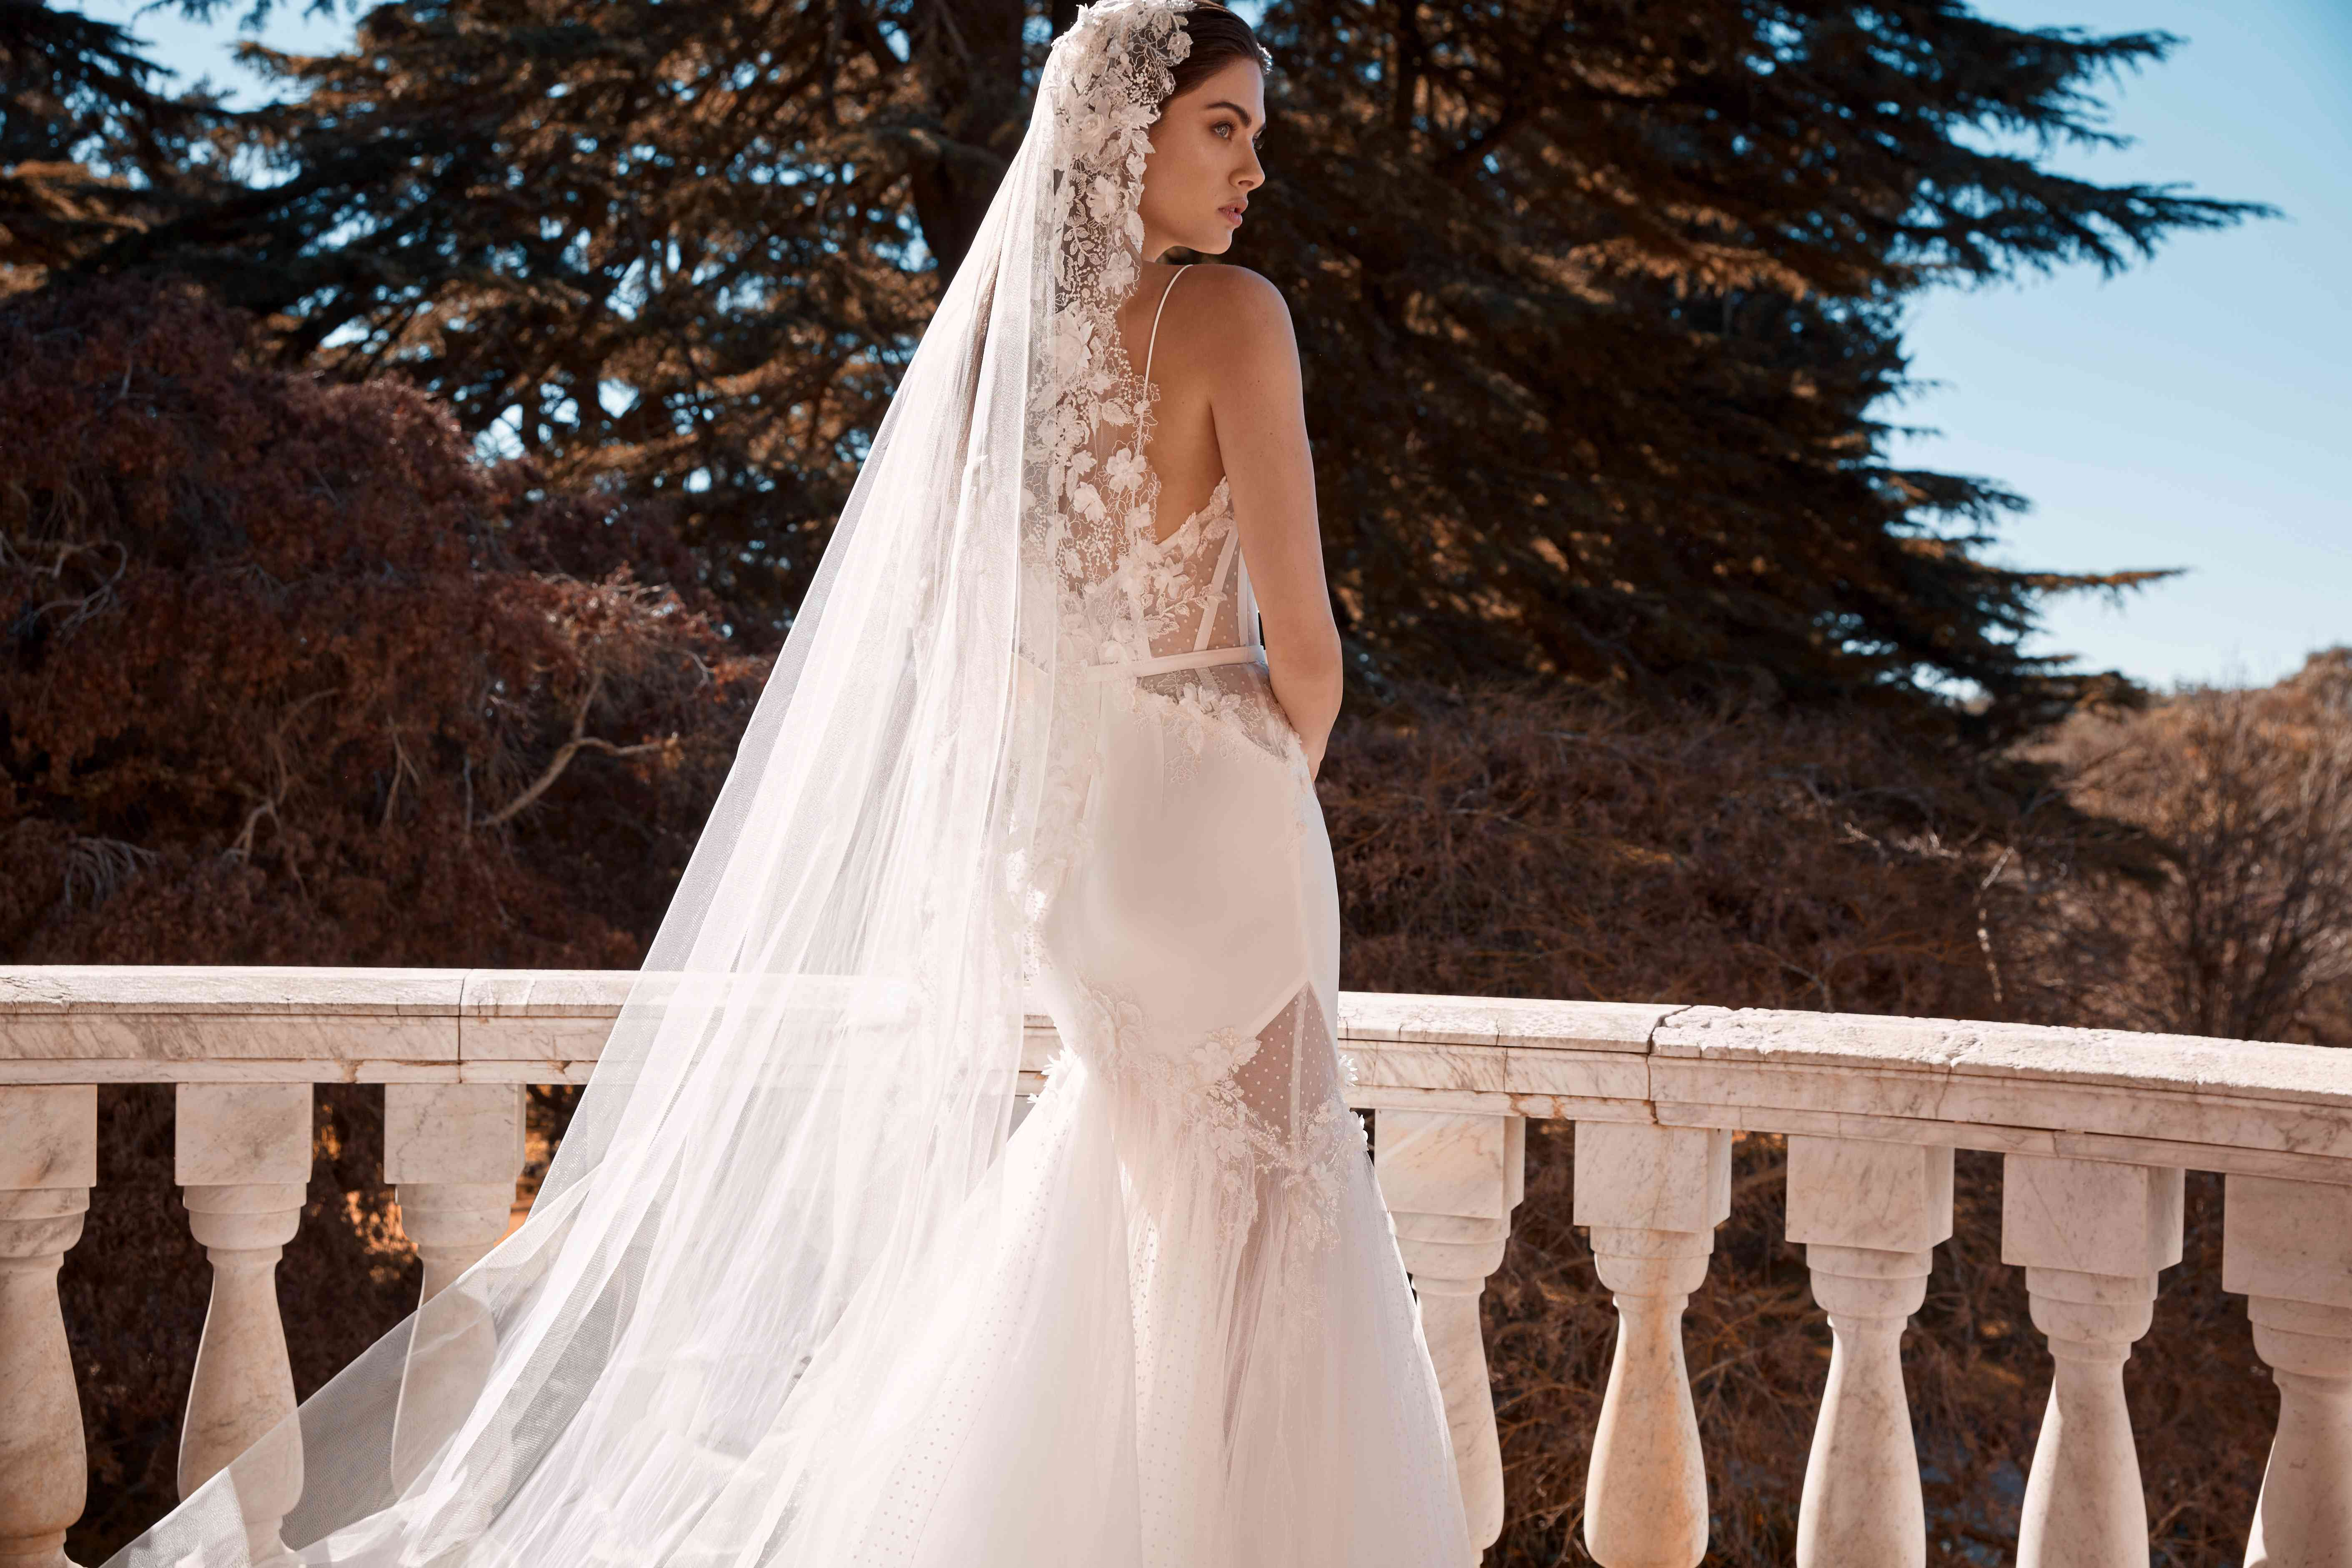 Evelyn embroidered wedding veil